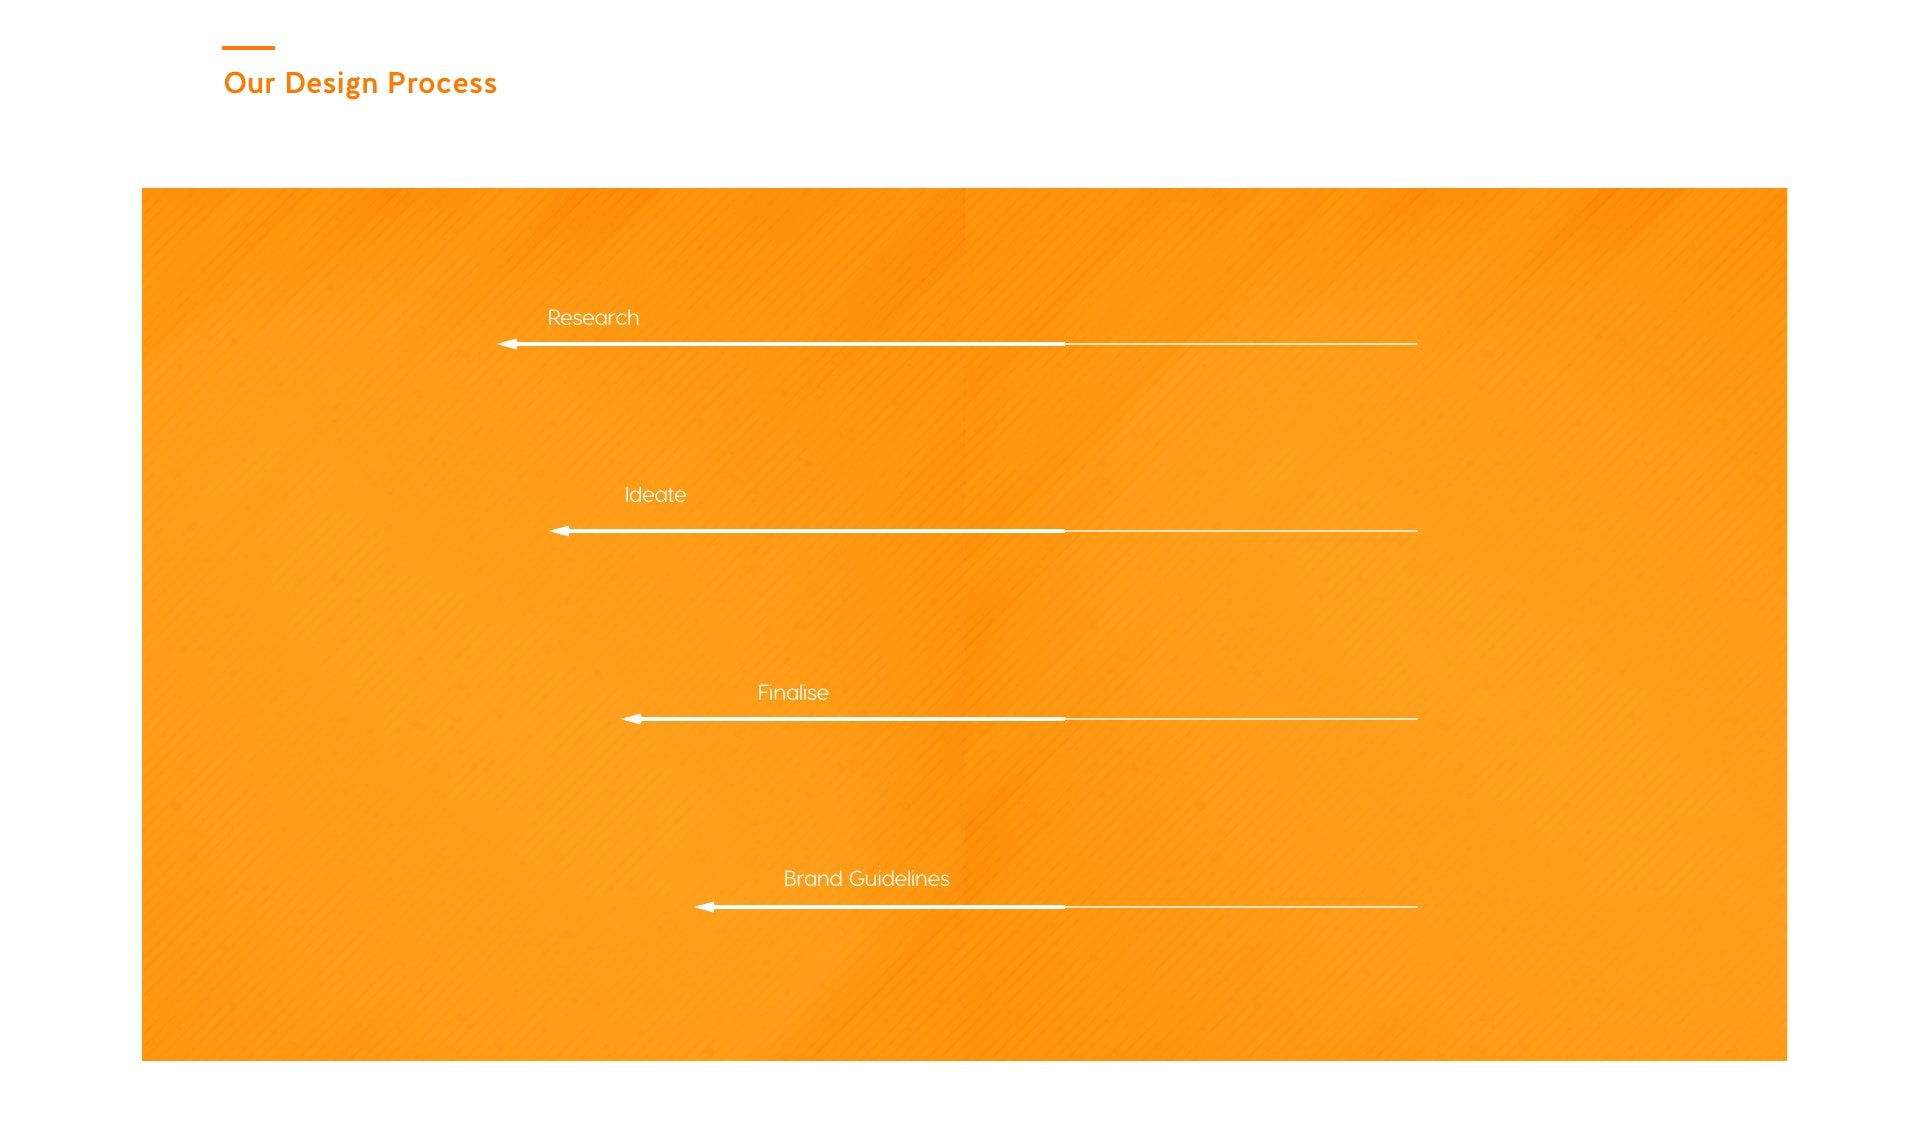 Our design process.